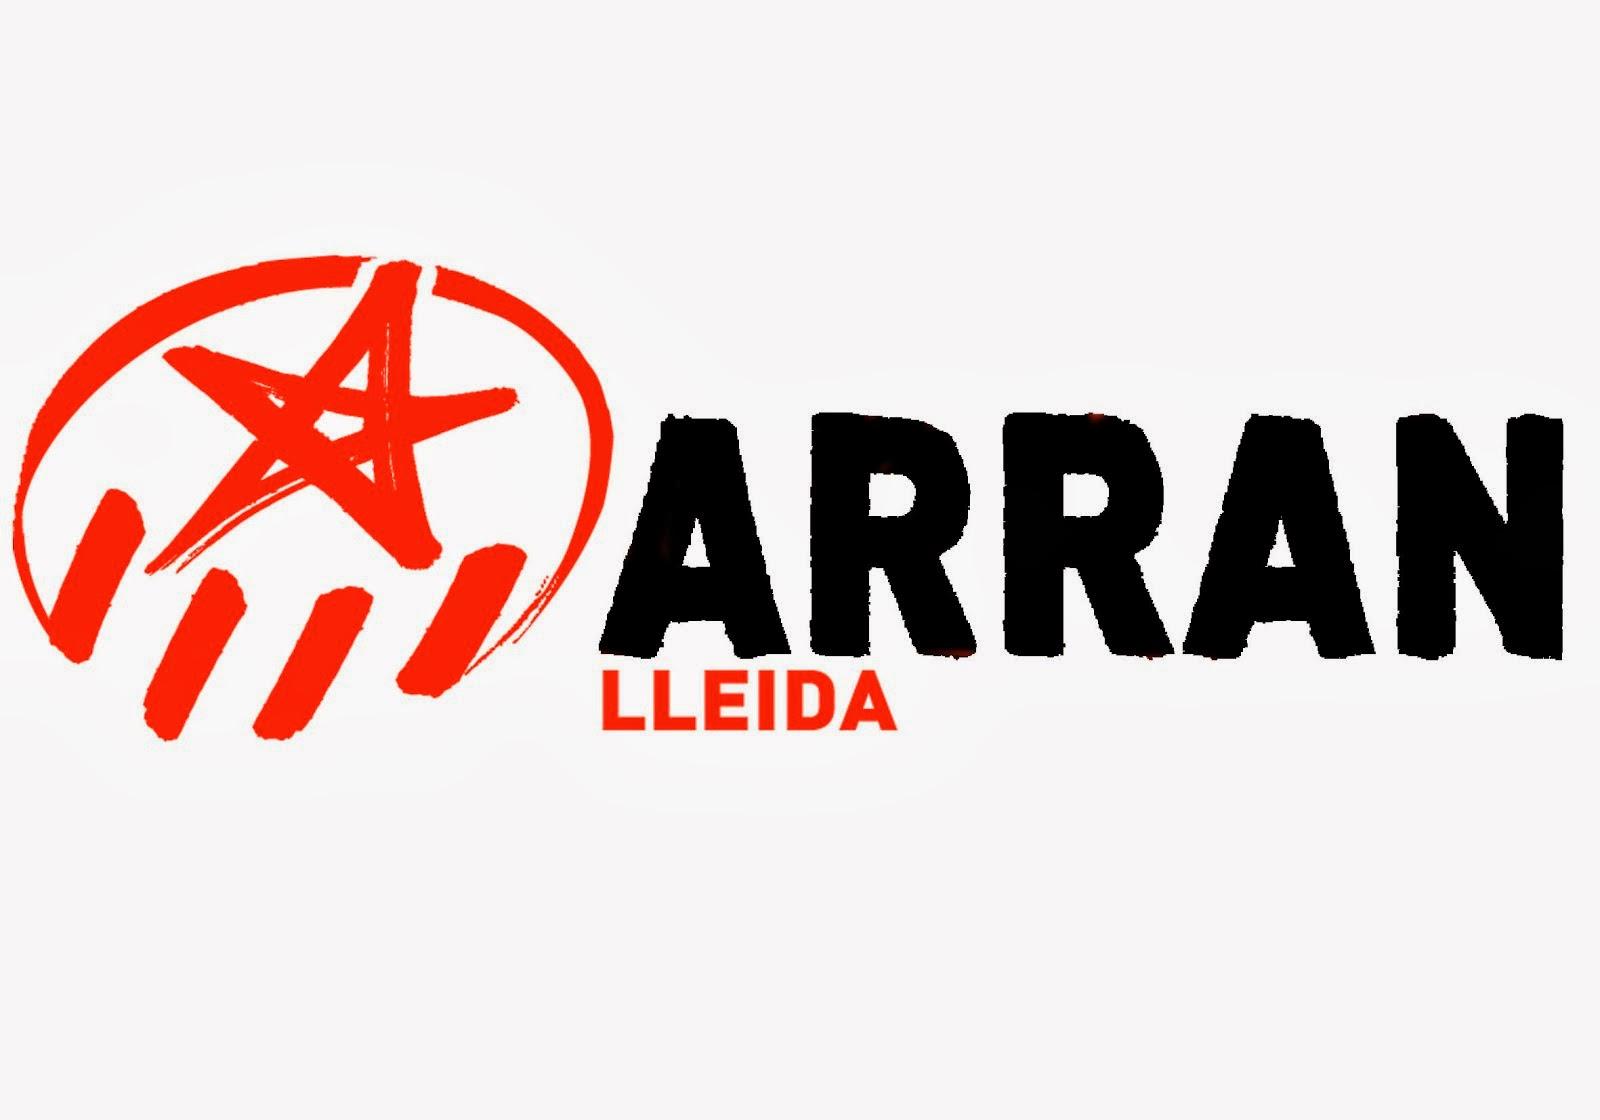 Arran Lleida